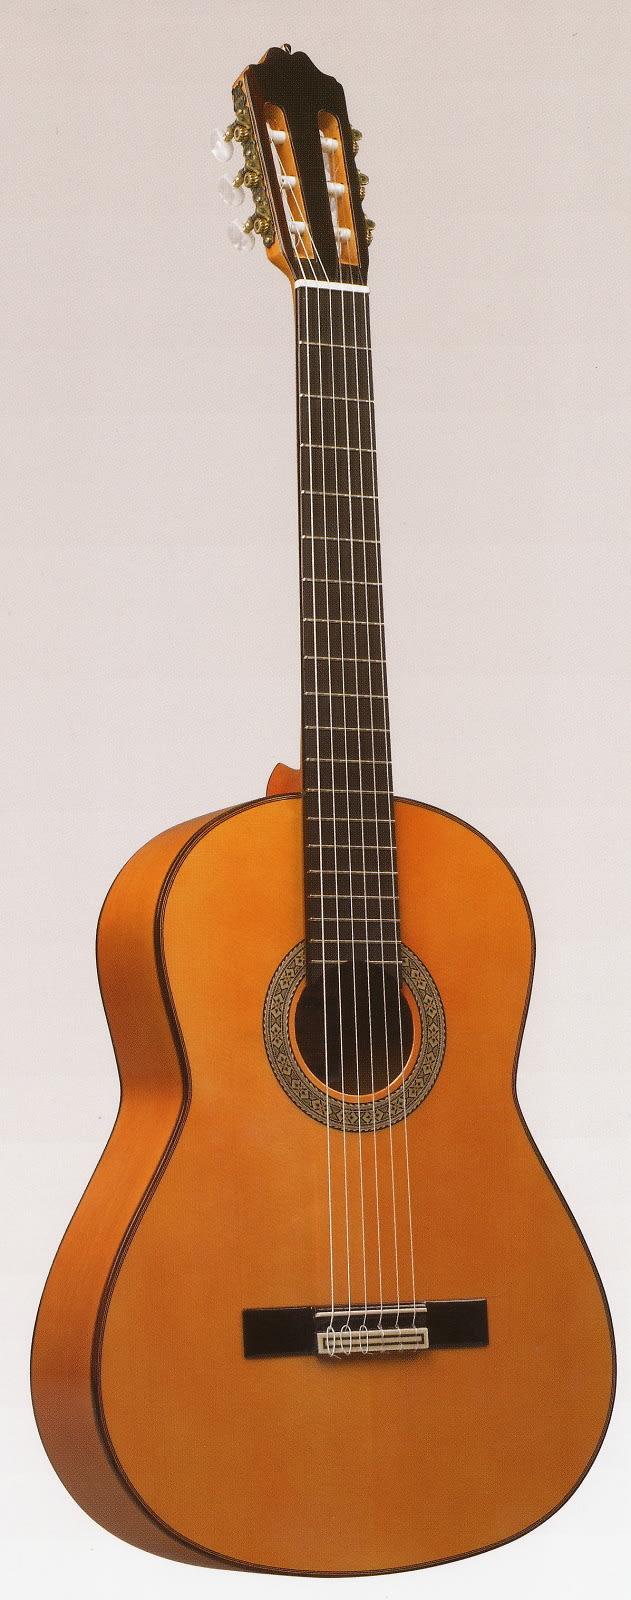 Estevé 9F  Professional Level Flamenco Guitar - Special - Spruce/Cypress